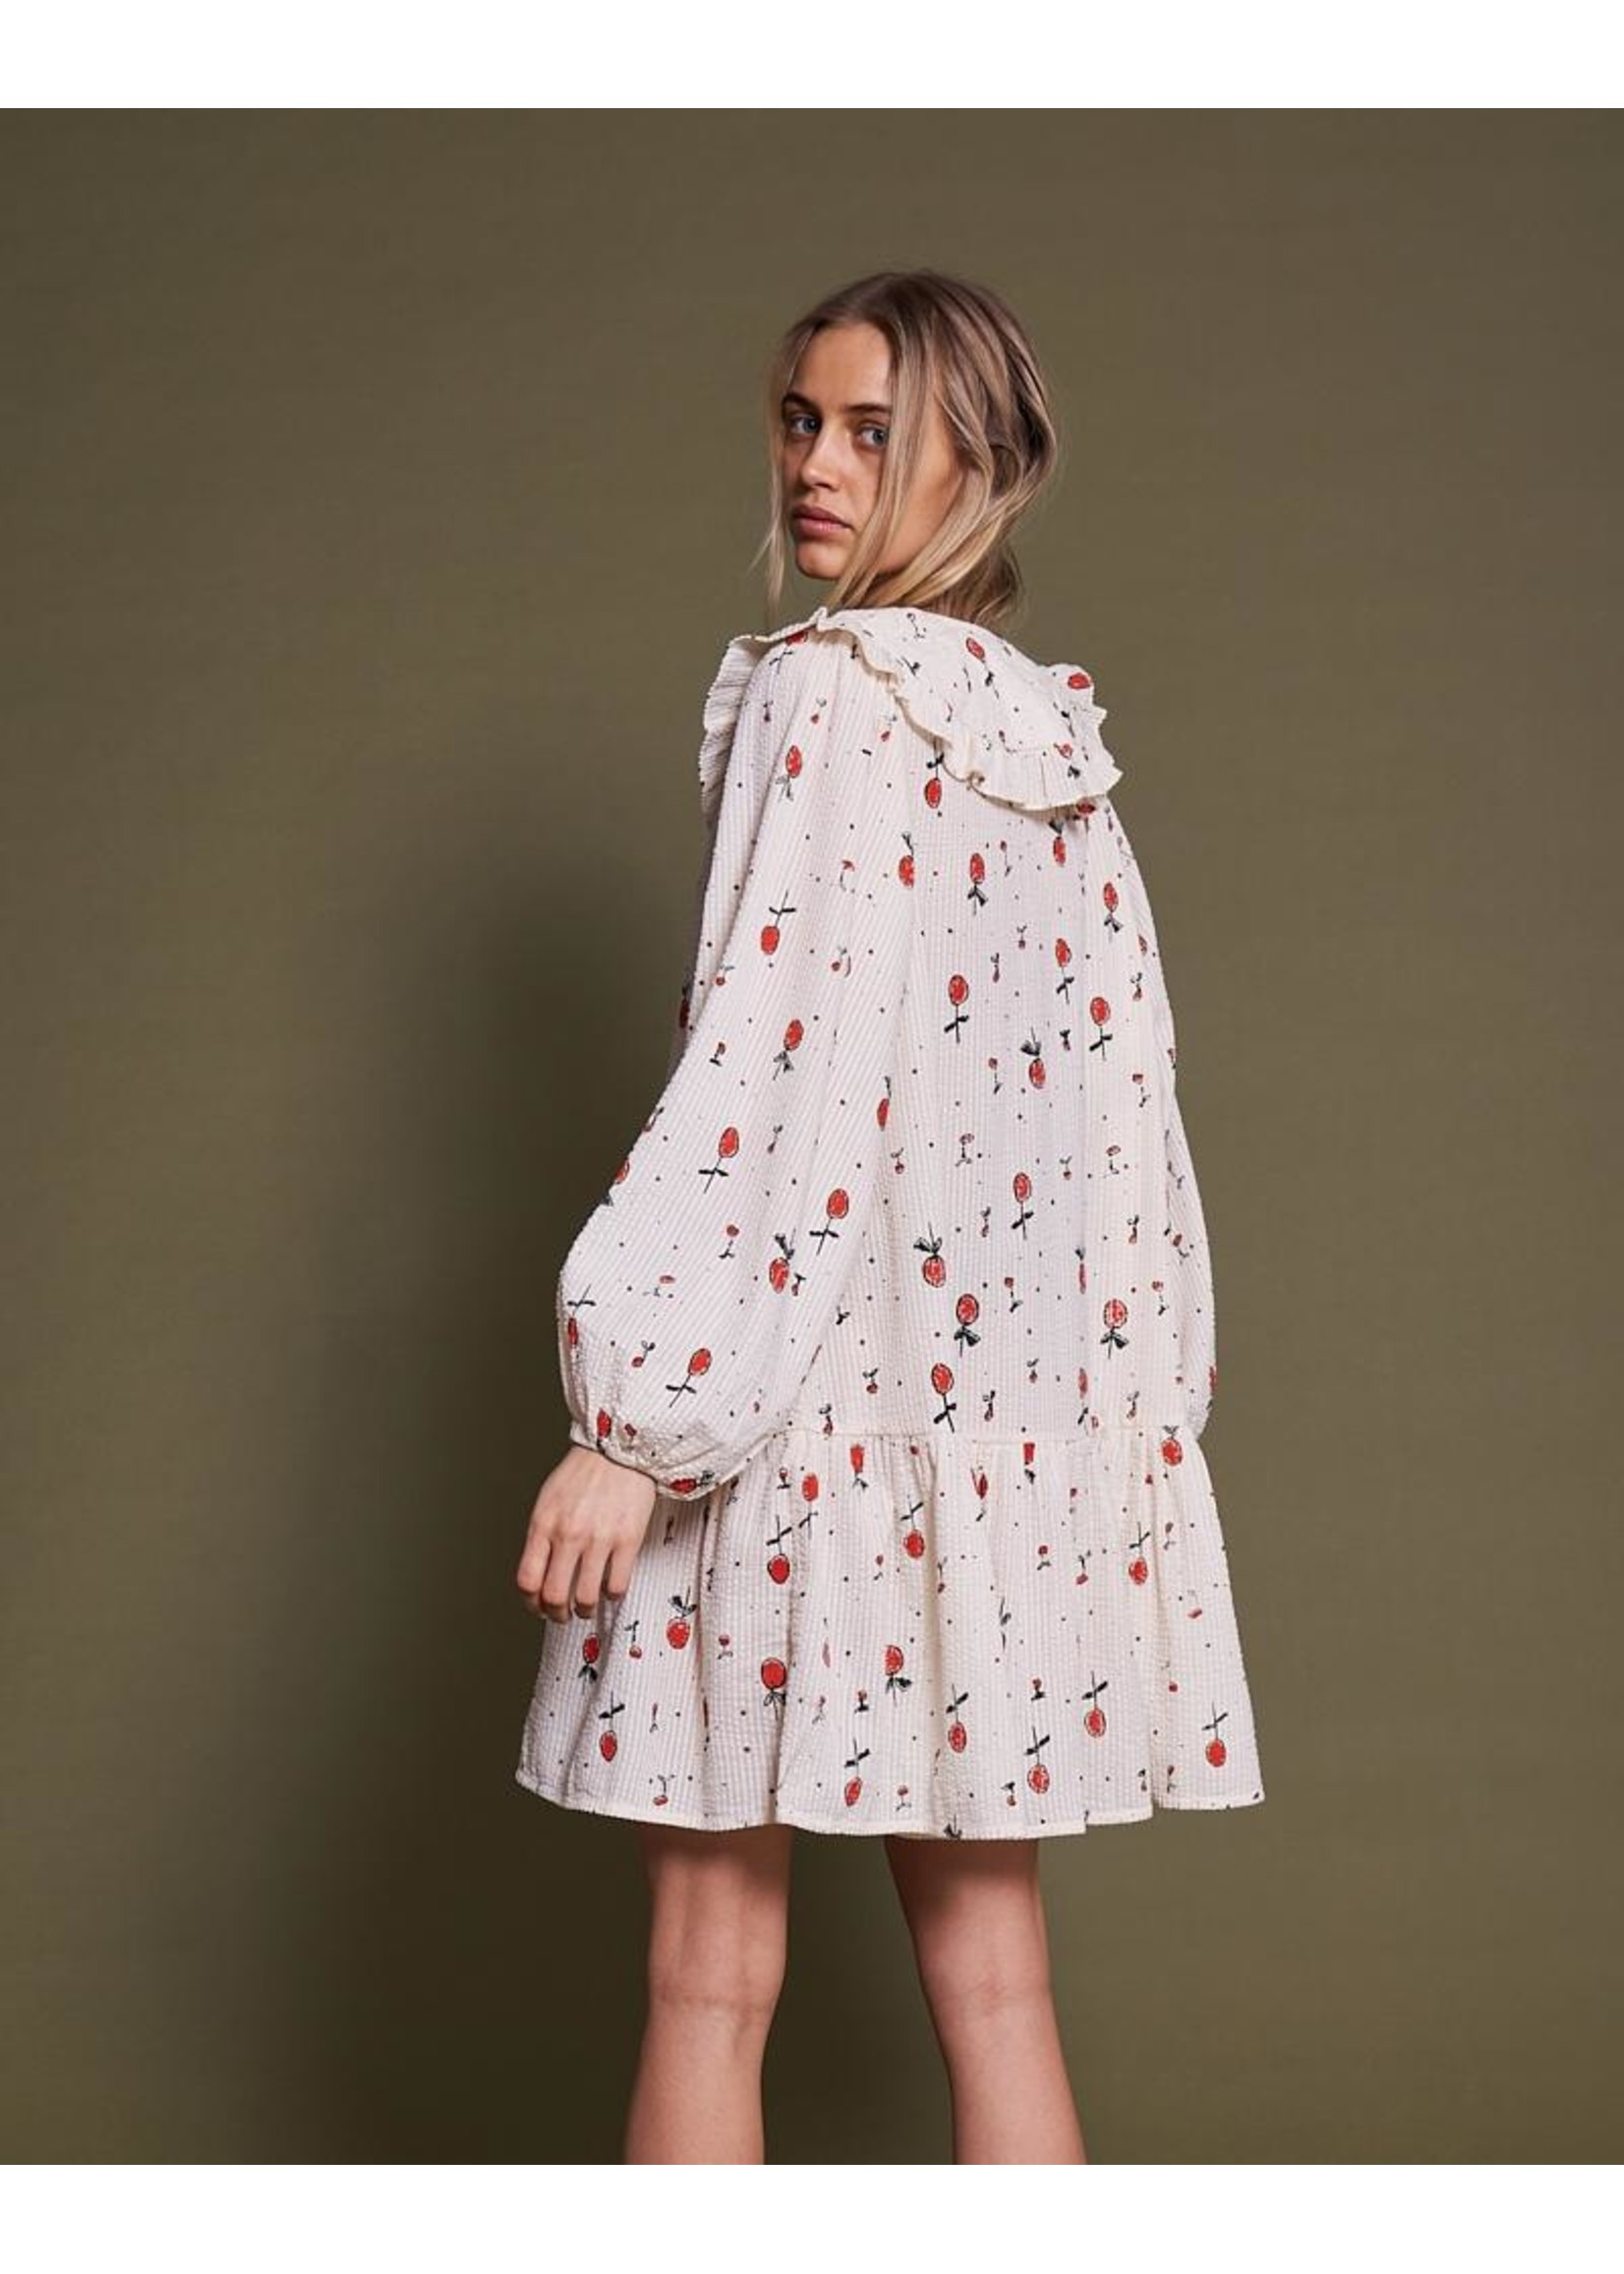 COLLAR CHERRY DRESS